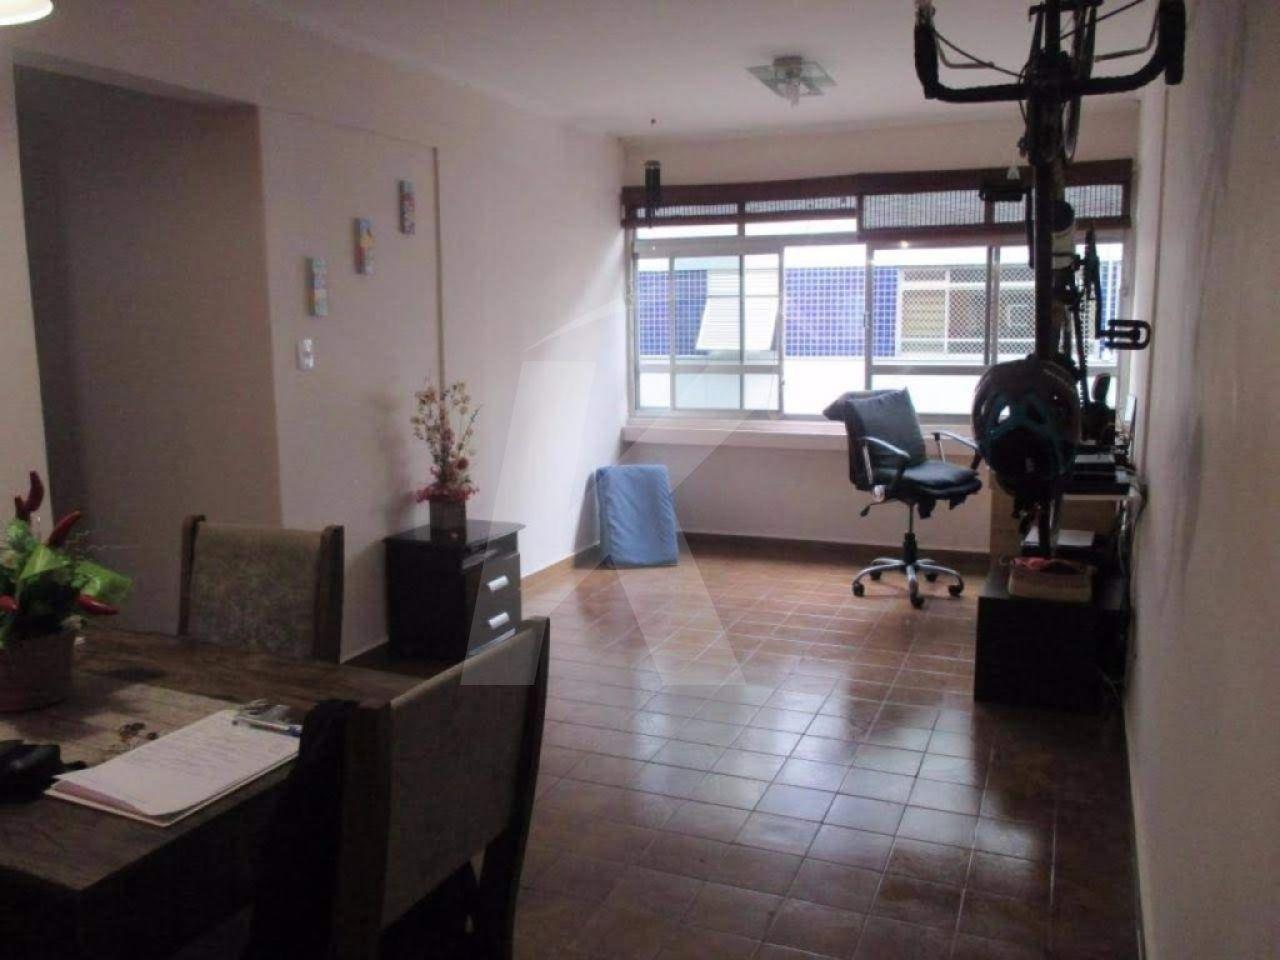 Apartamento Jaçanã - 2 Dormitório(s) - São Paulo - SP - REF. KA10043